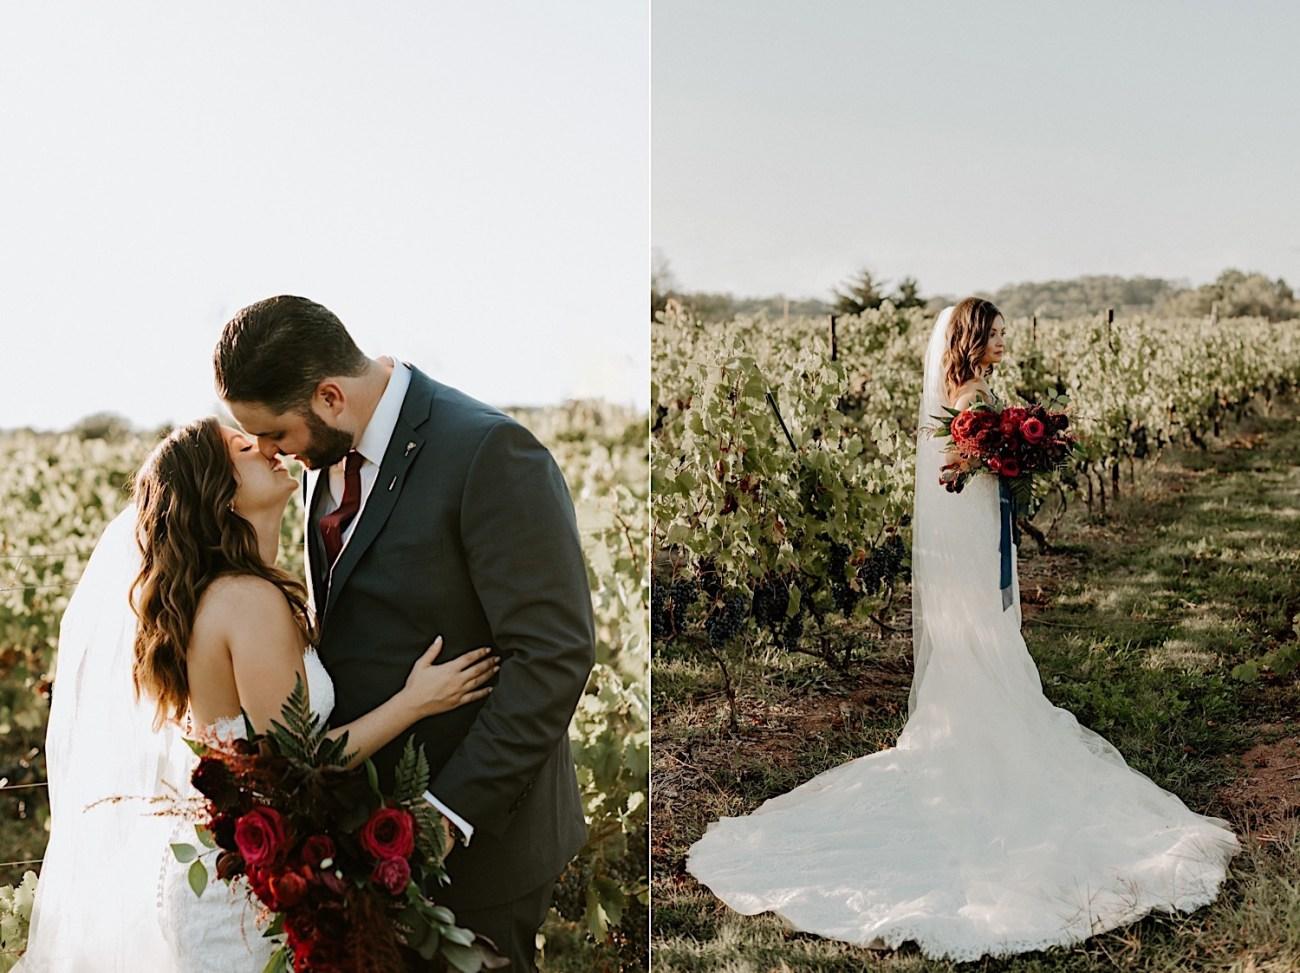 Hopewell Valley Vineyards Wedding New Jersey Wedding Photographer 19